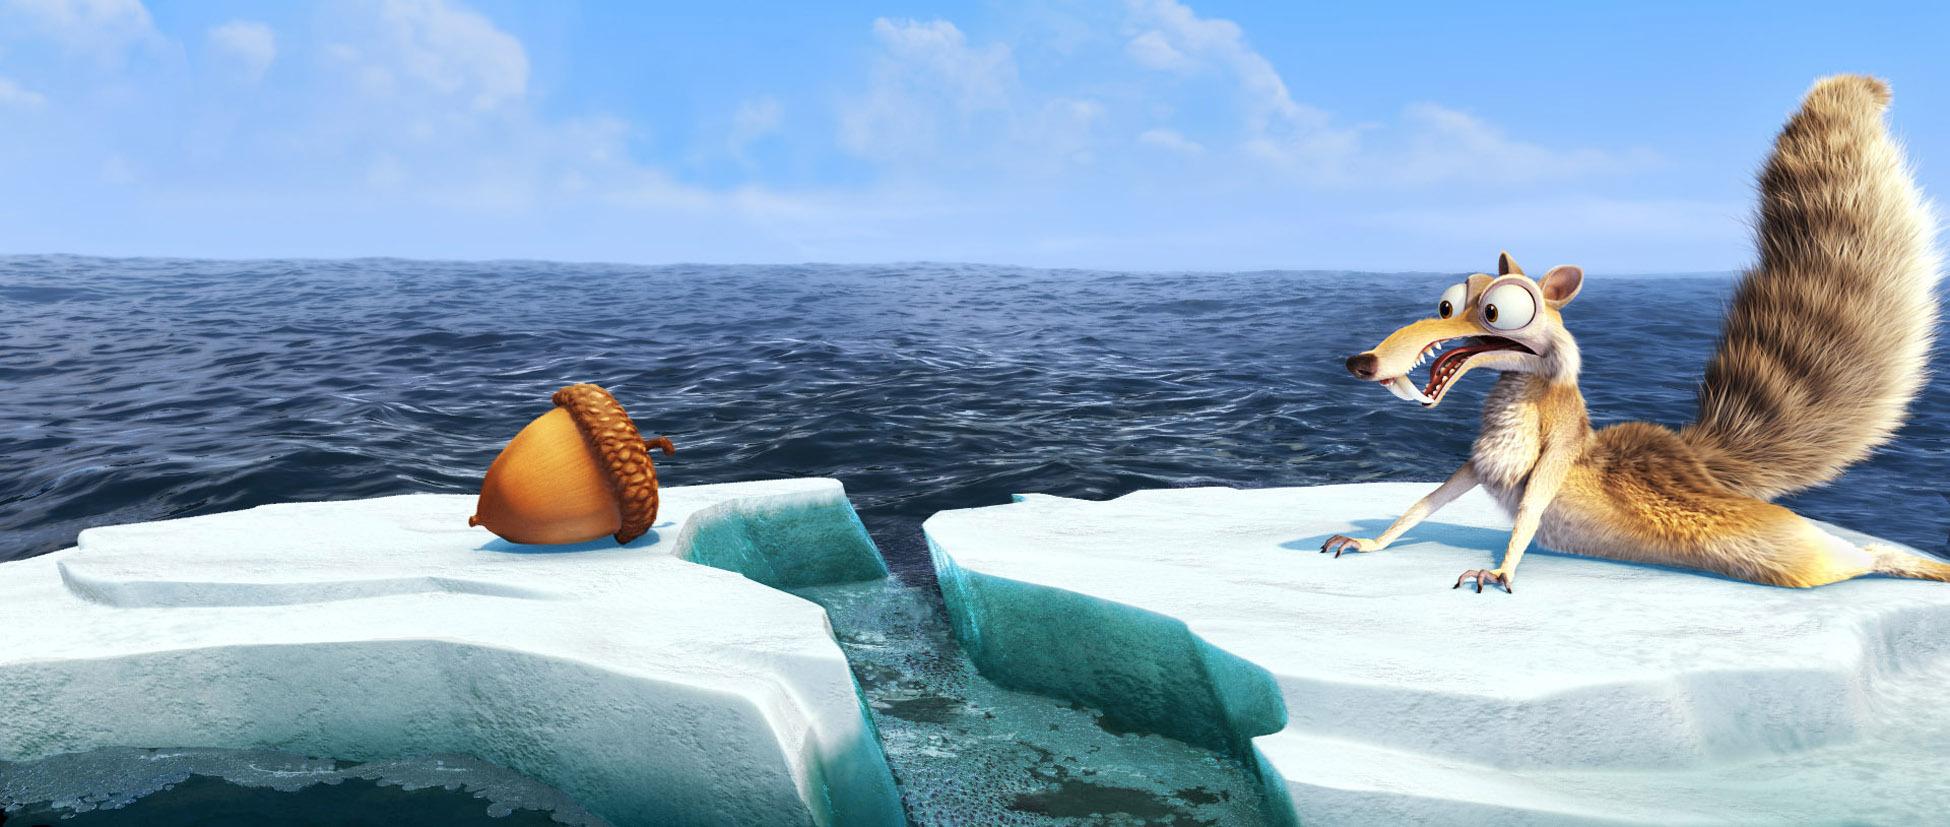 Ice Age: Continental Drift 2 - HeyUGuys